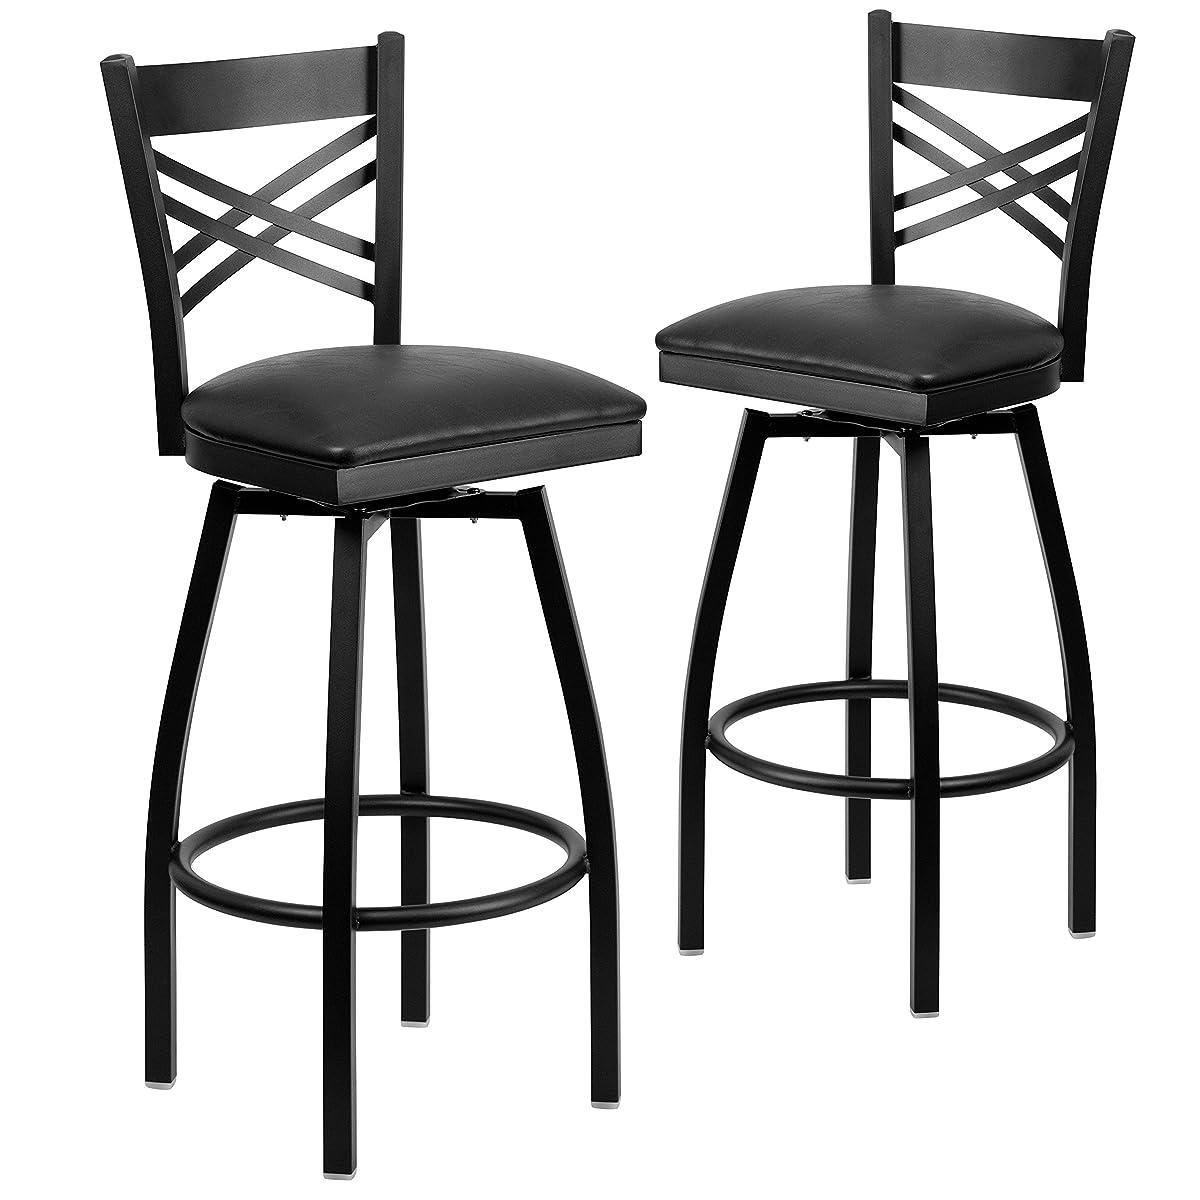 Flash Furniture 2 Pk. HERCULES Series Black X Back Swivel Metal Barstool - Black Vinyl Seat